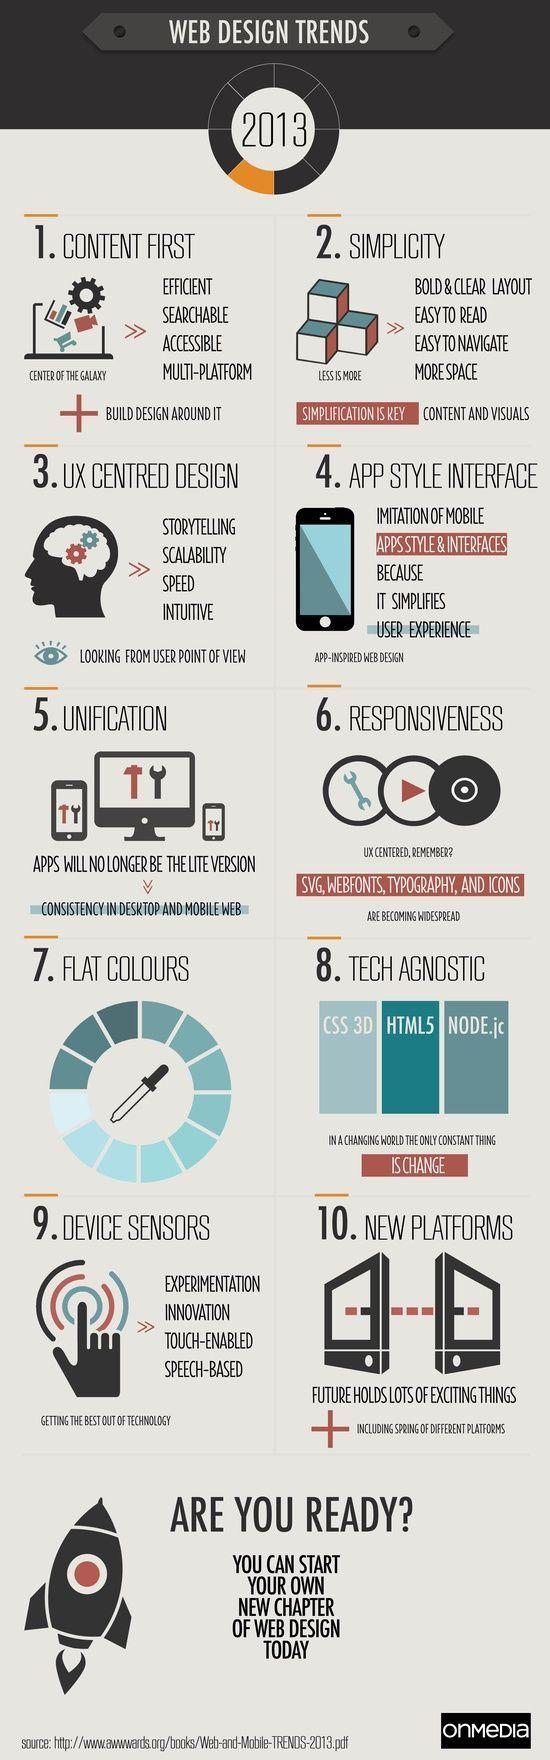 Web Design Trends for 2013